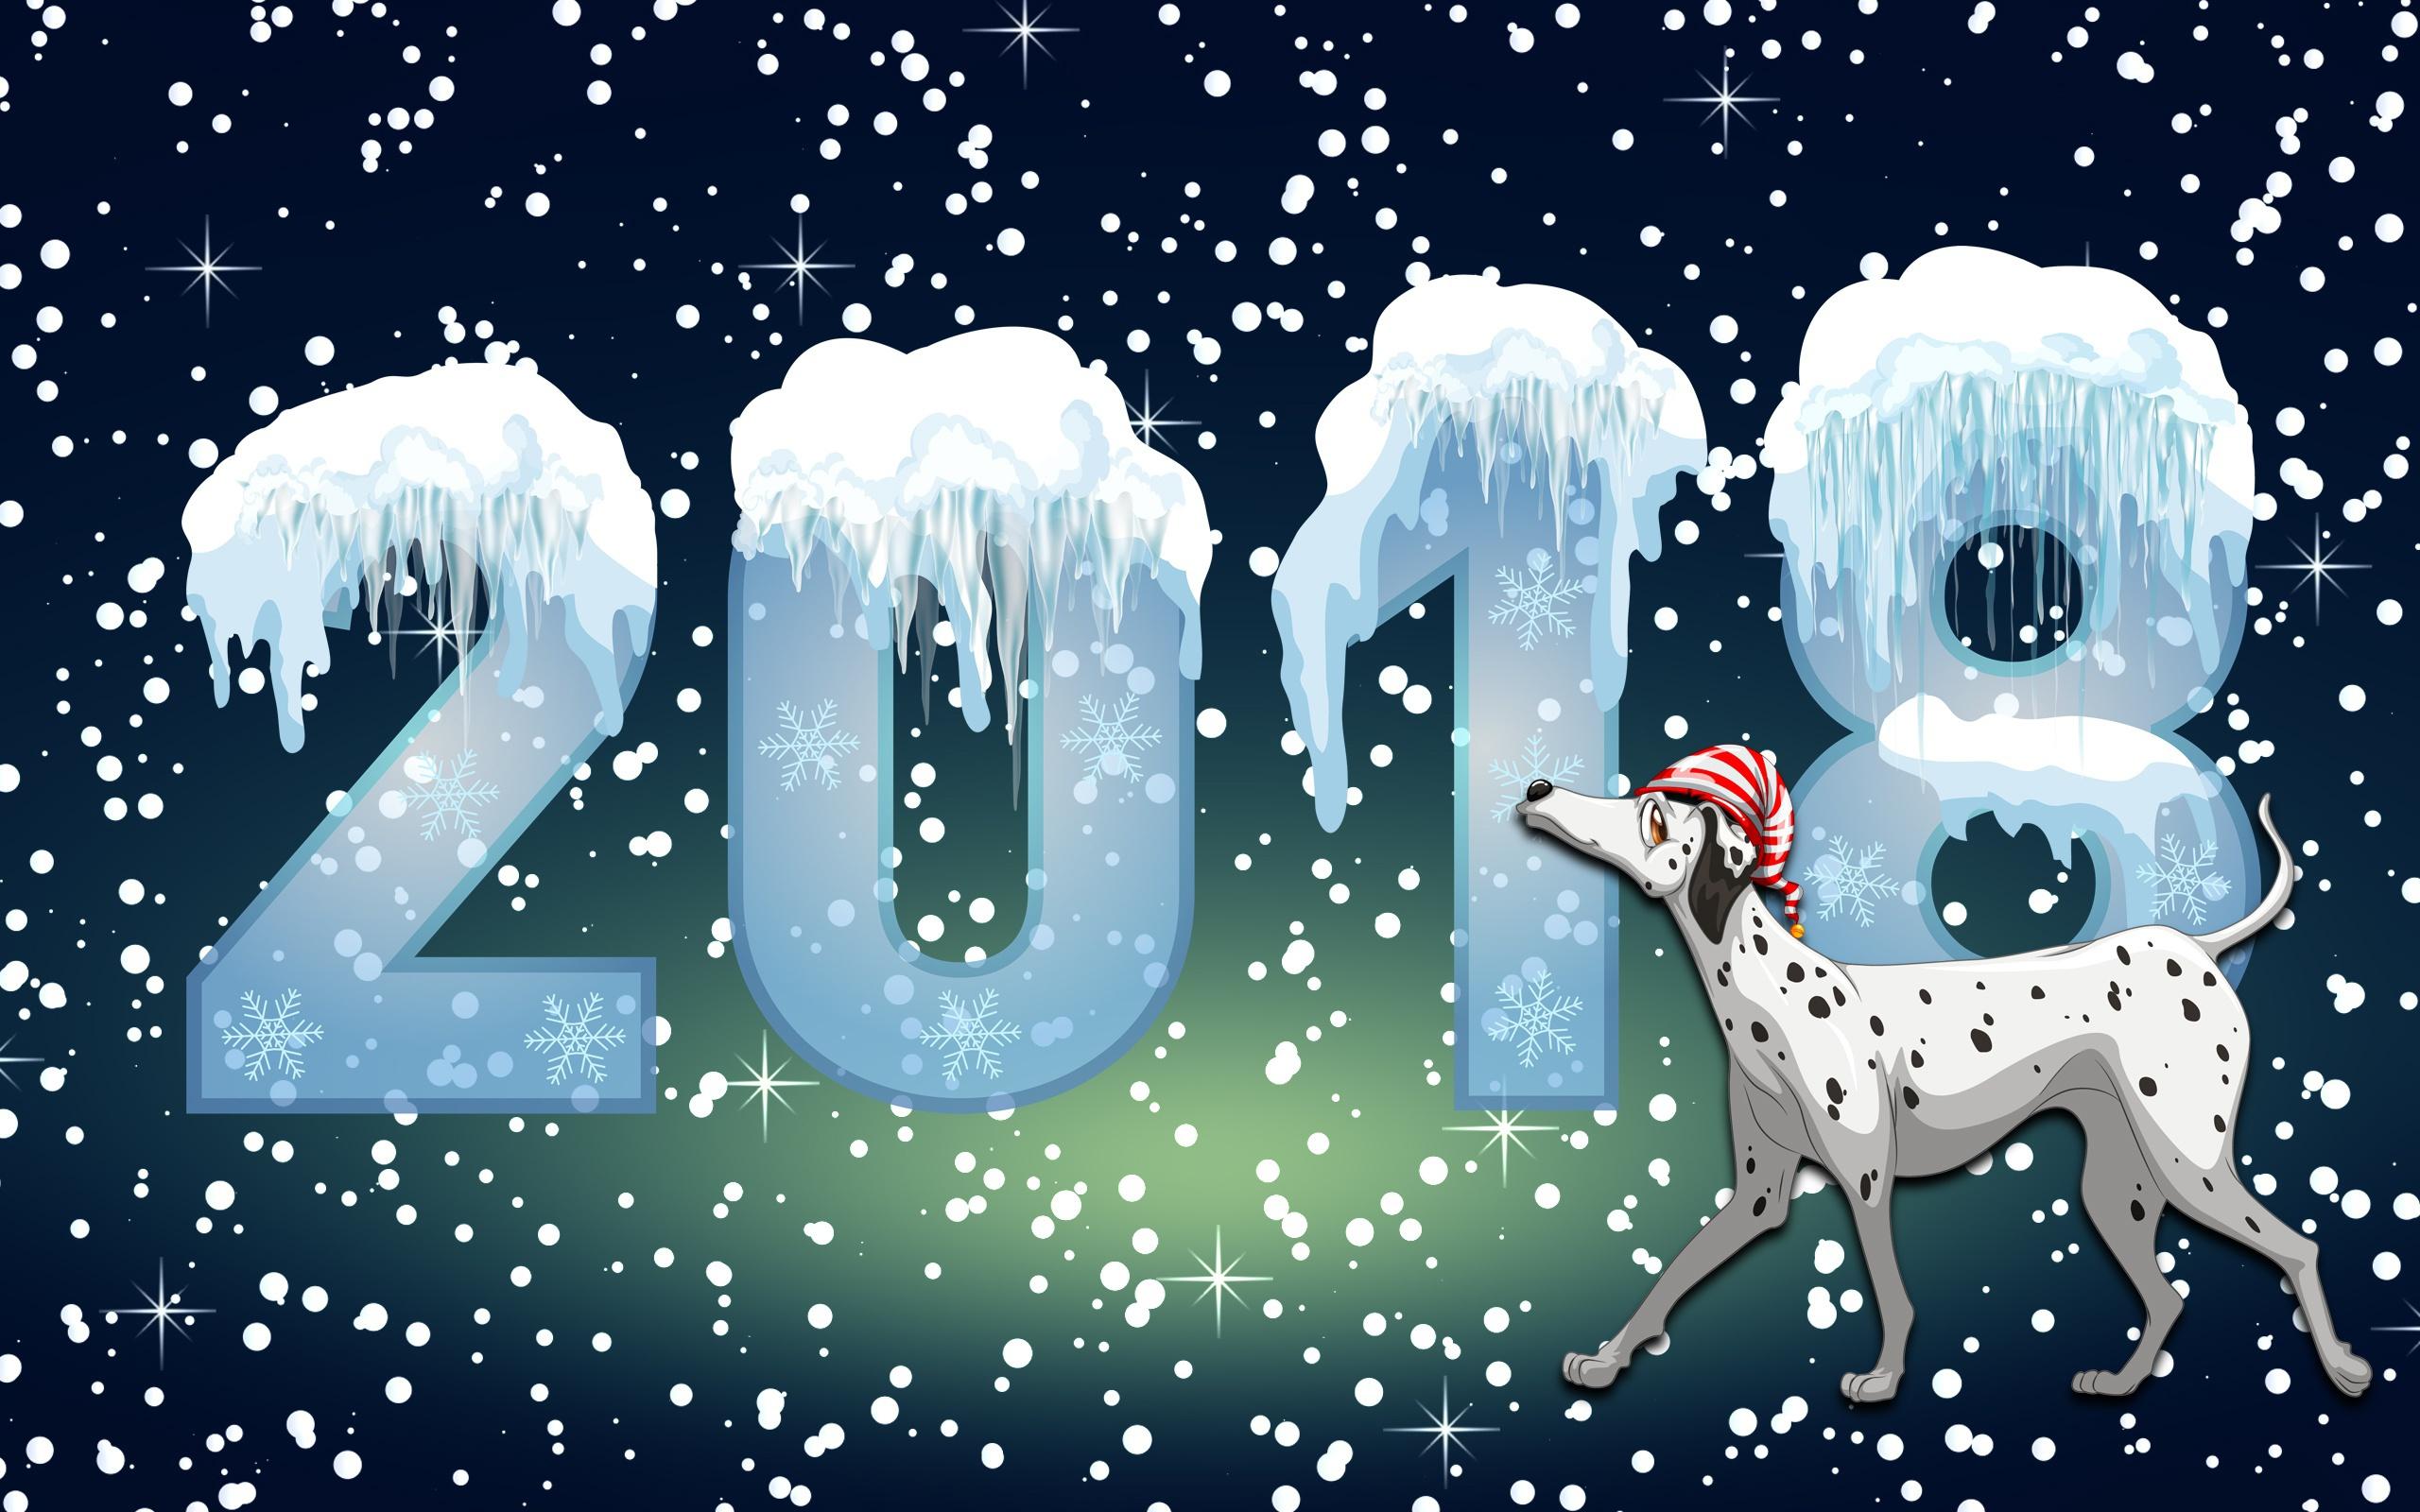 Мужчине, картинки с новый год 2018